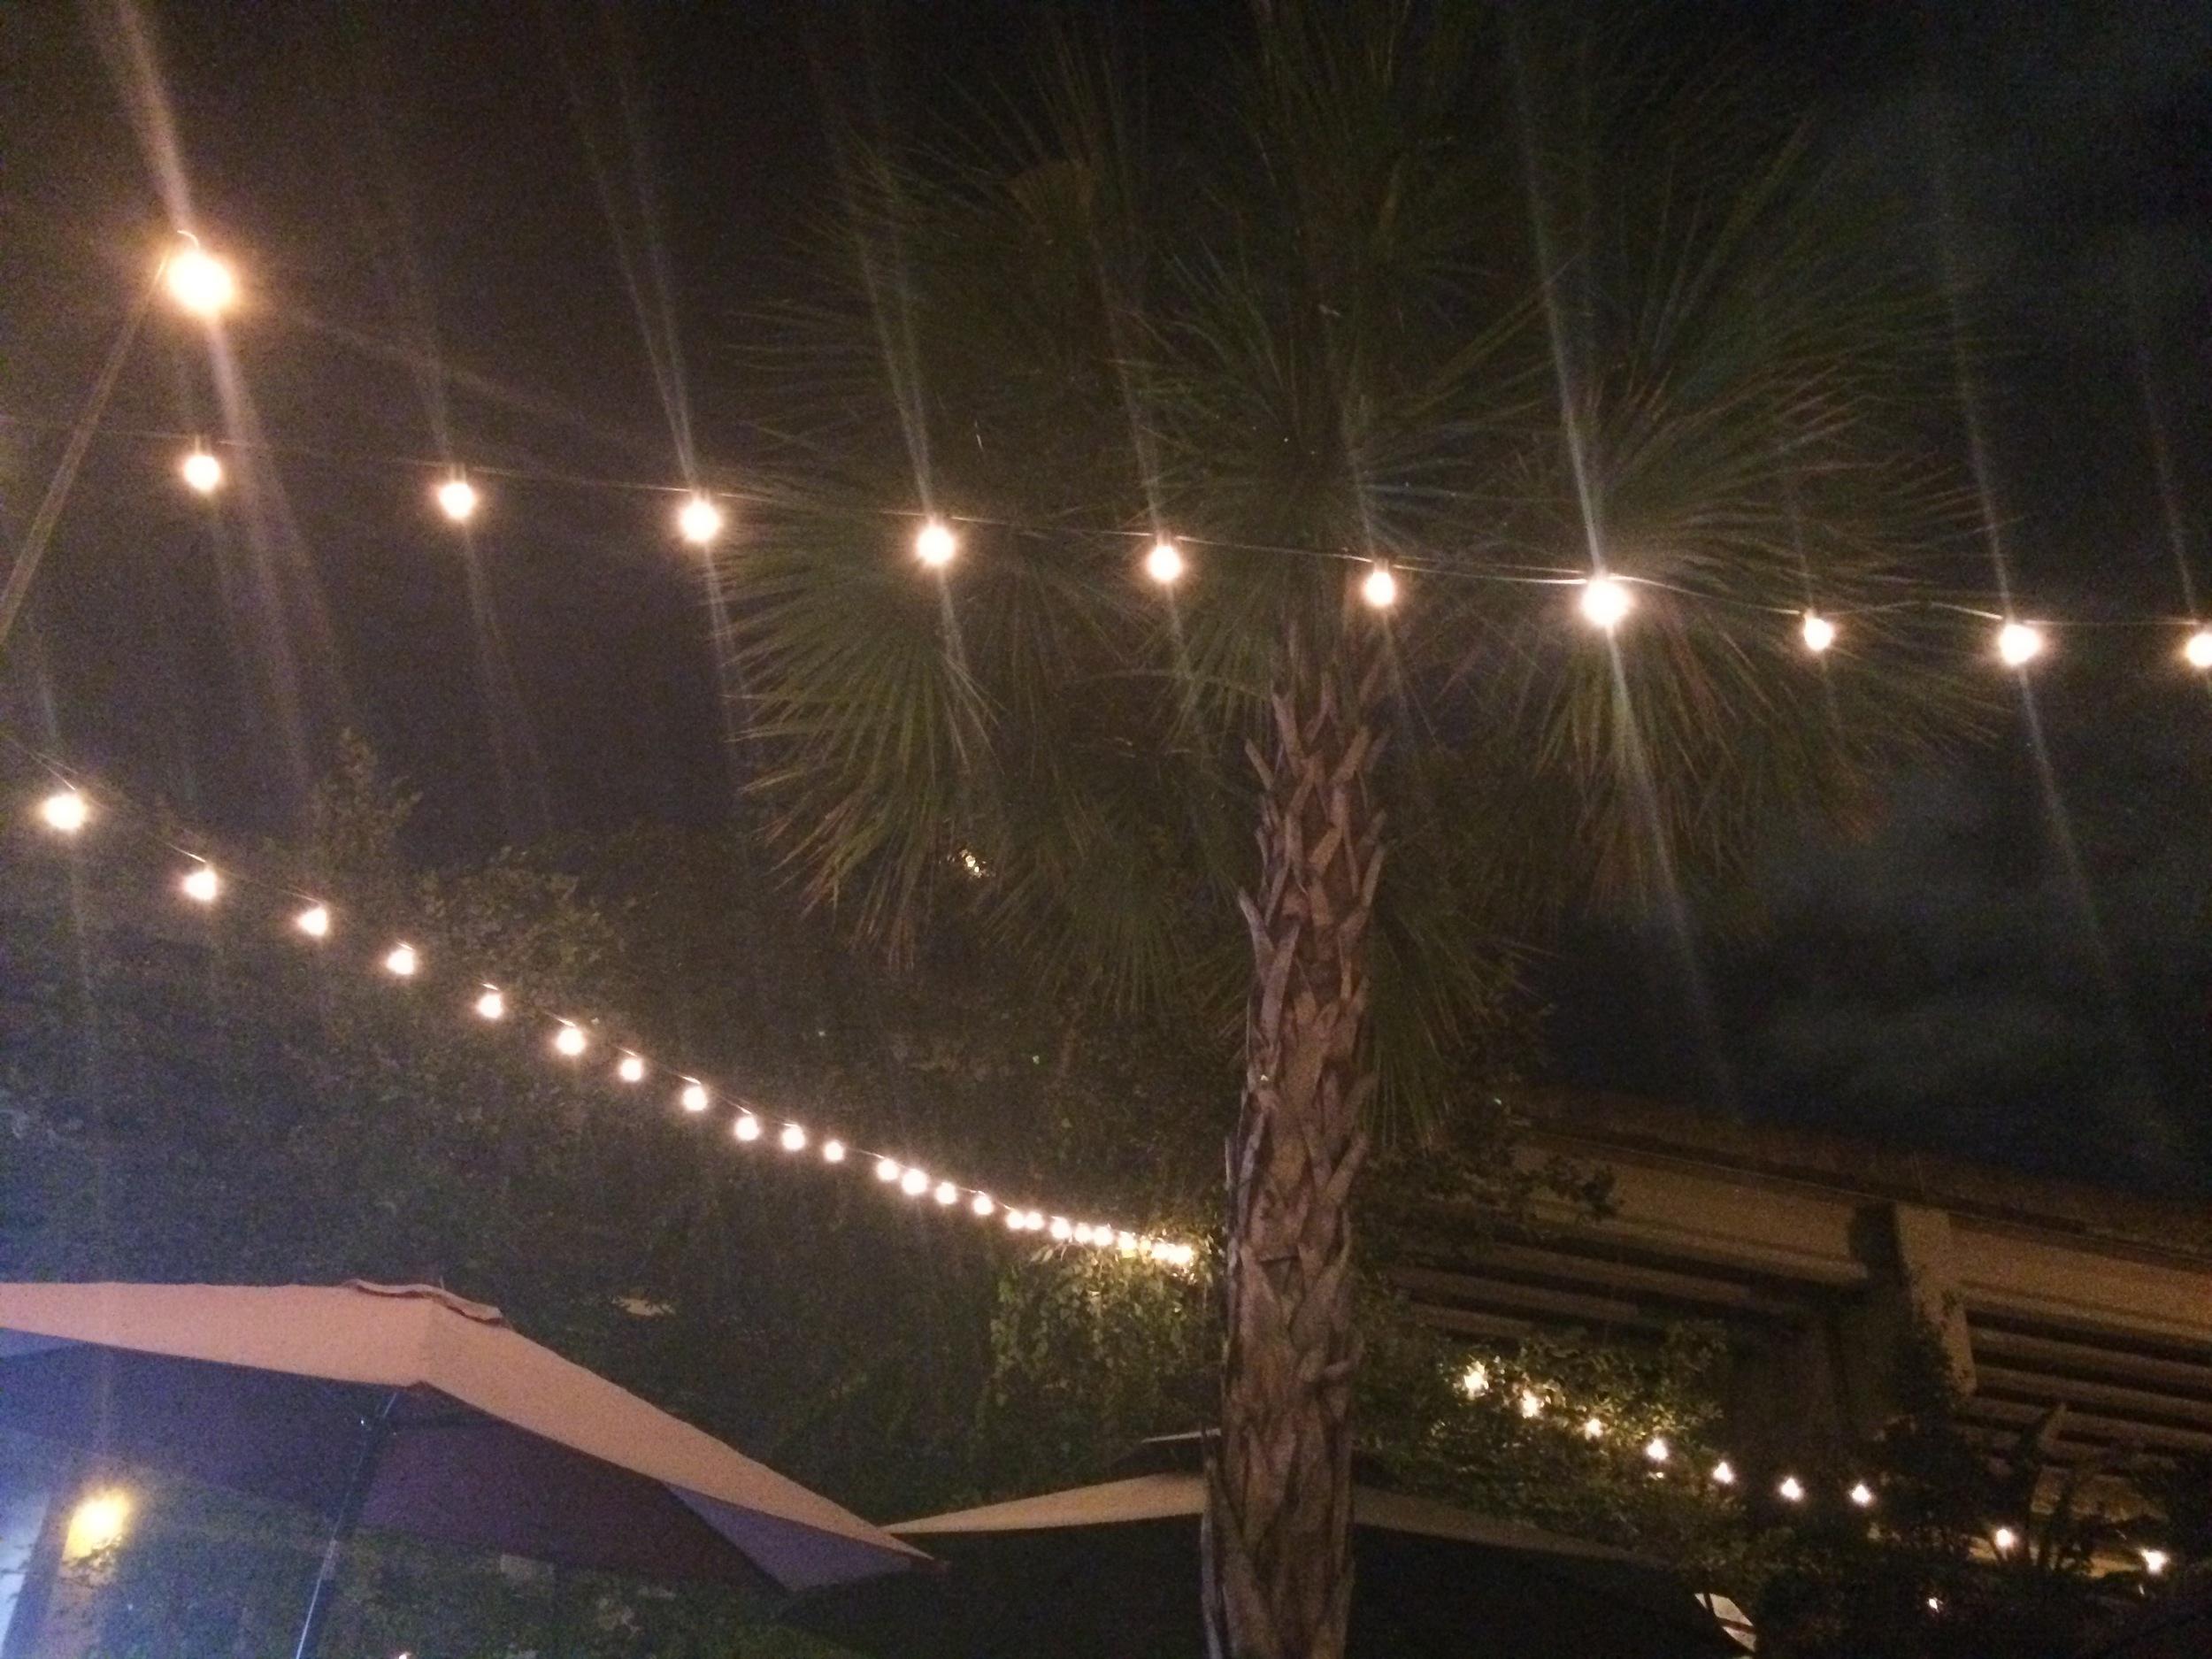 Bar Beneath the Bridge - New Orleans, LA